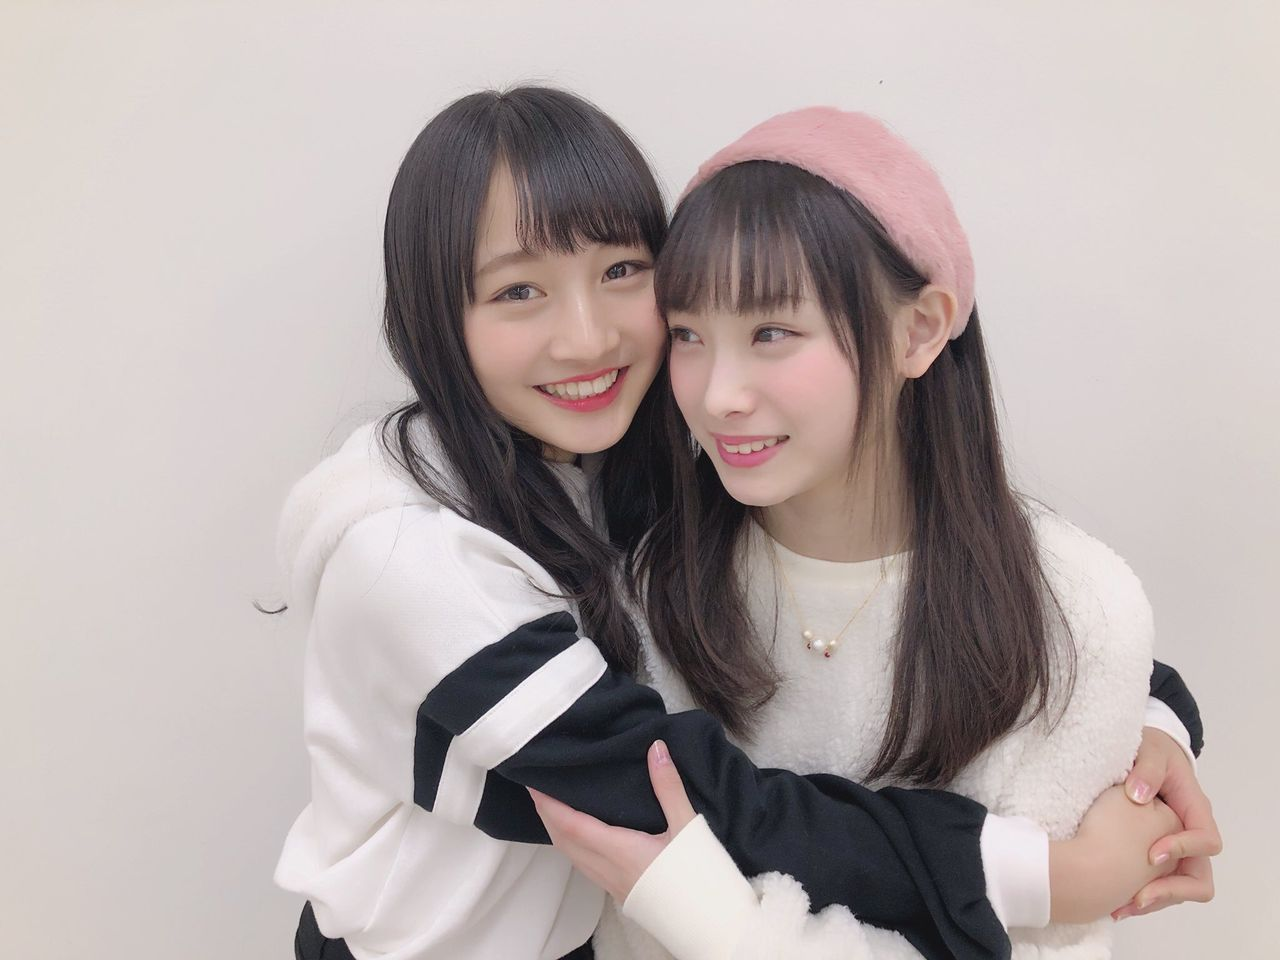 【NMB48】梅山恋和かわいすぎワロタwwww